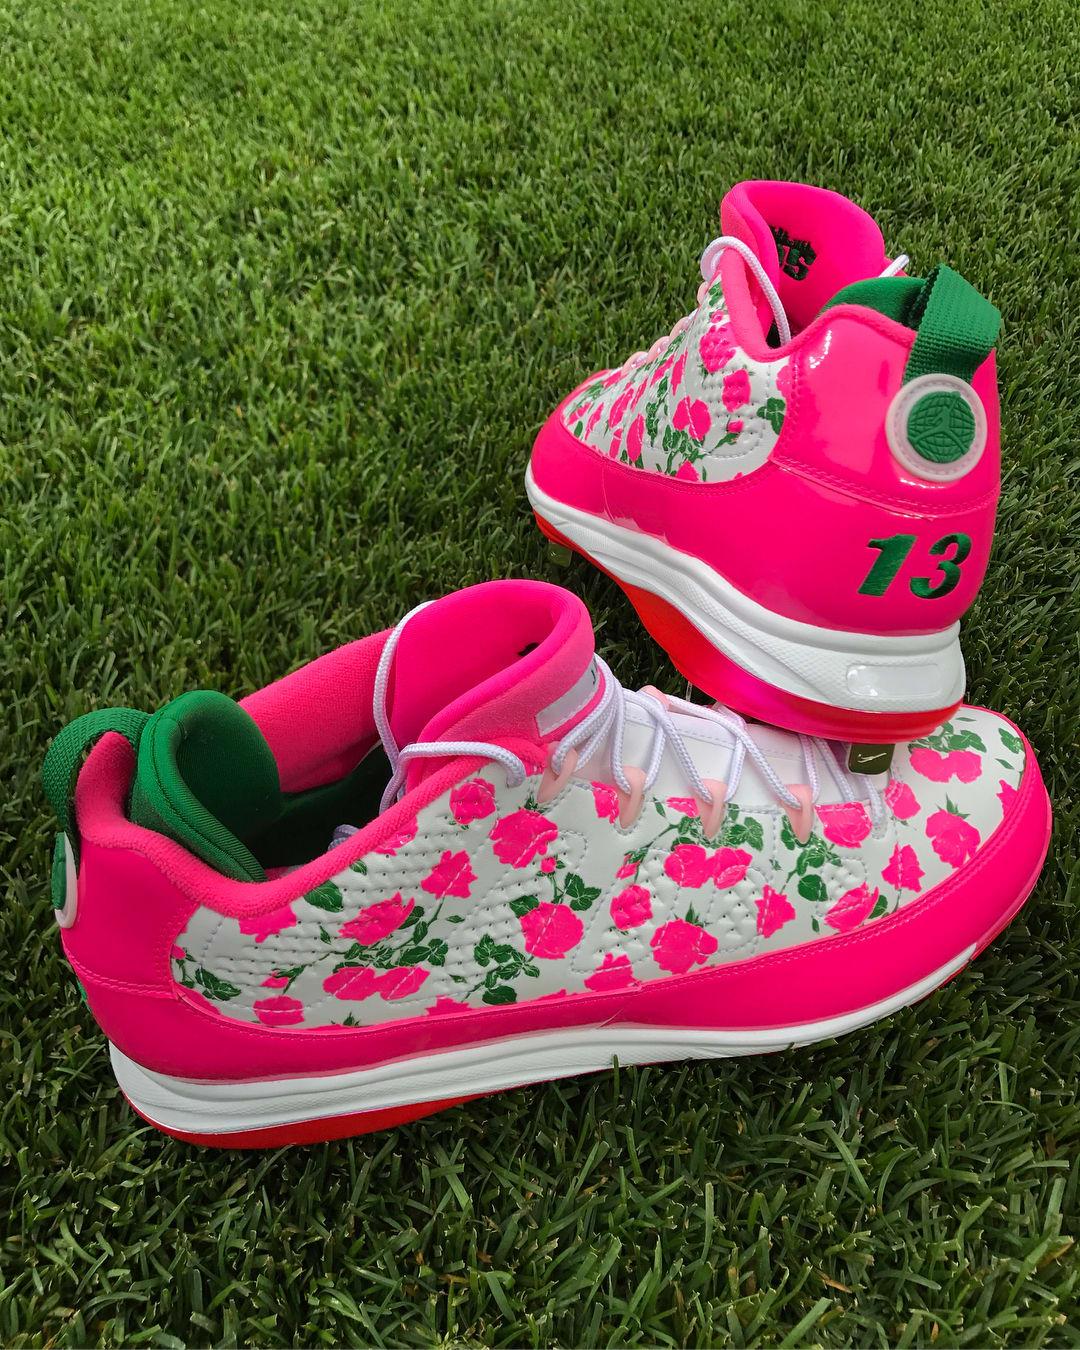 Air Jordan 9 Low Mother's Day Manny Machado PE Heel